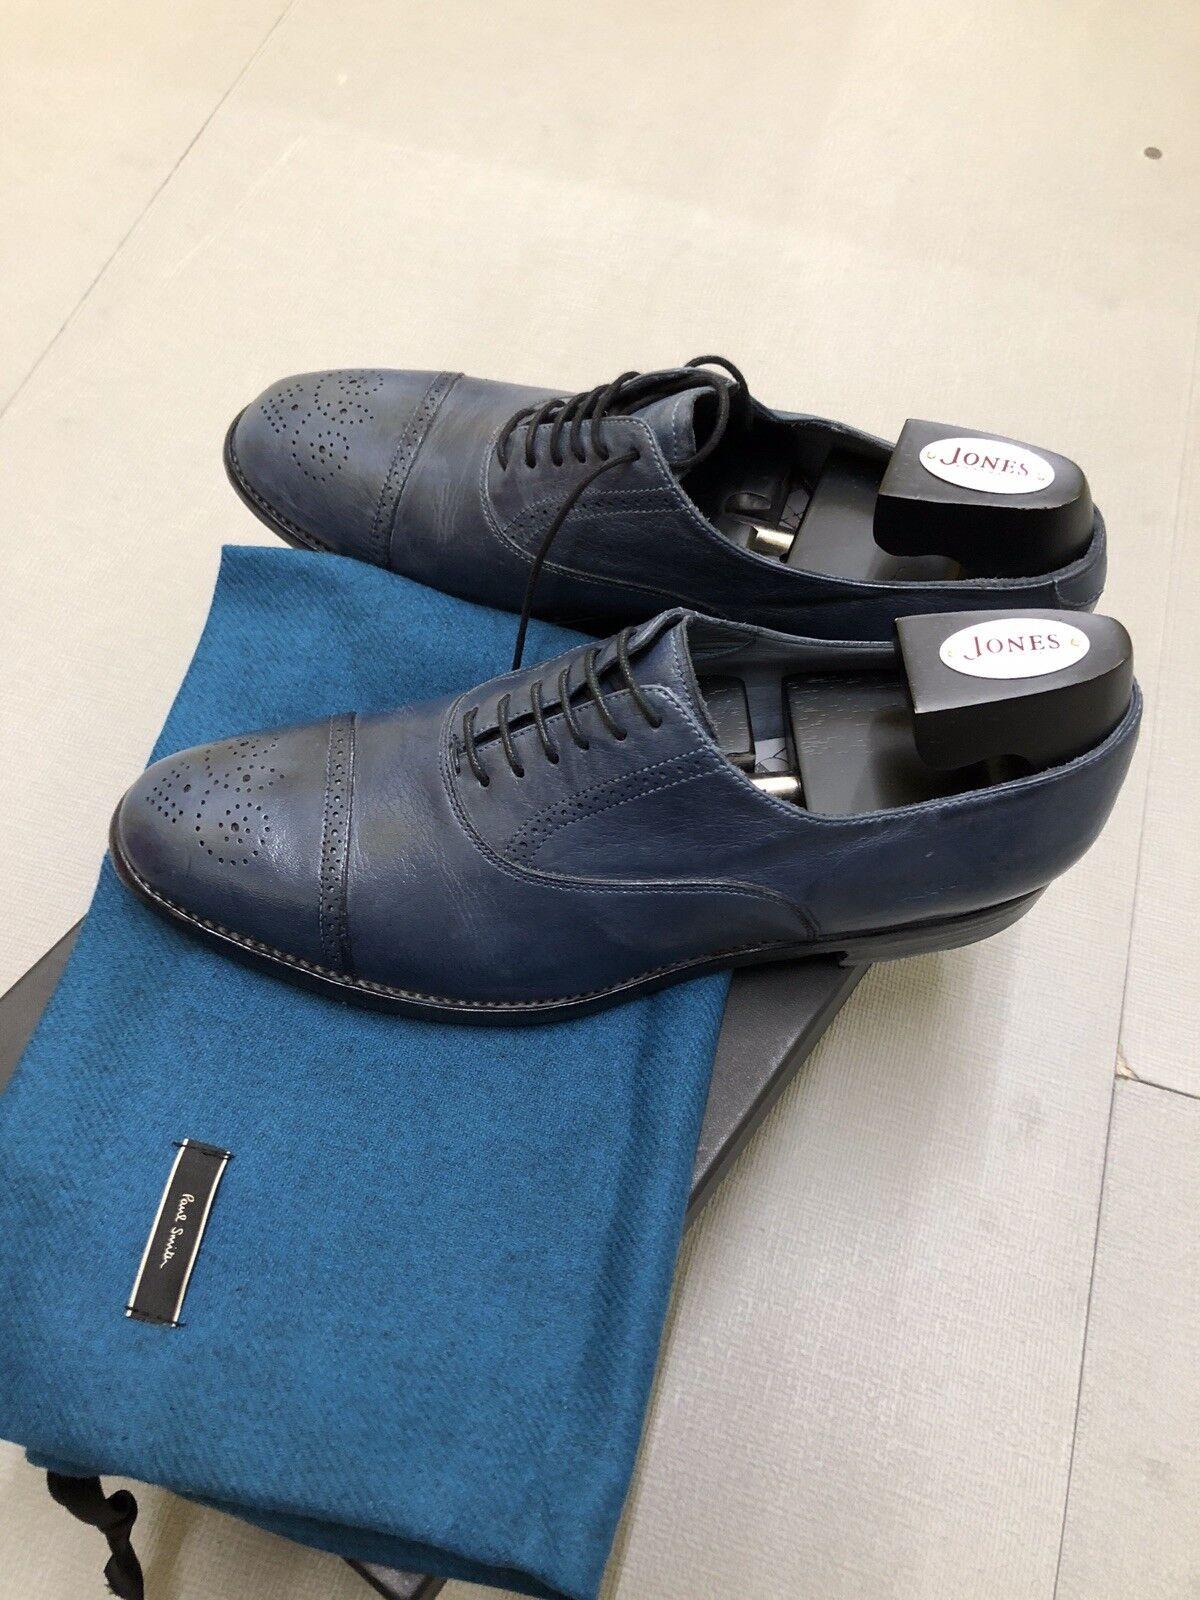 Paul Smith Hombre Calzado Burton Azul UK8 Nueva con caja.